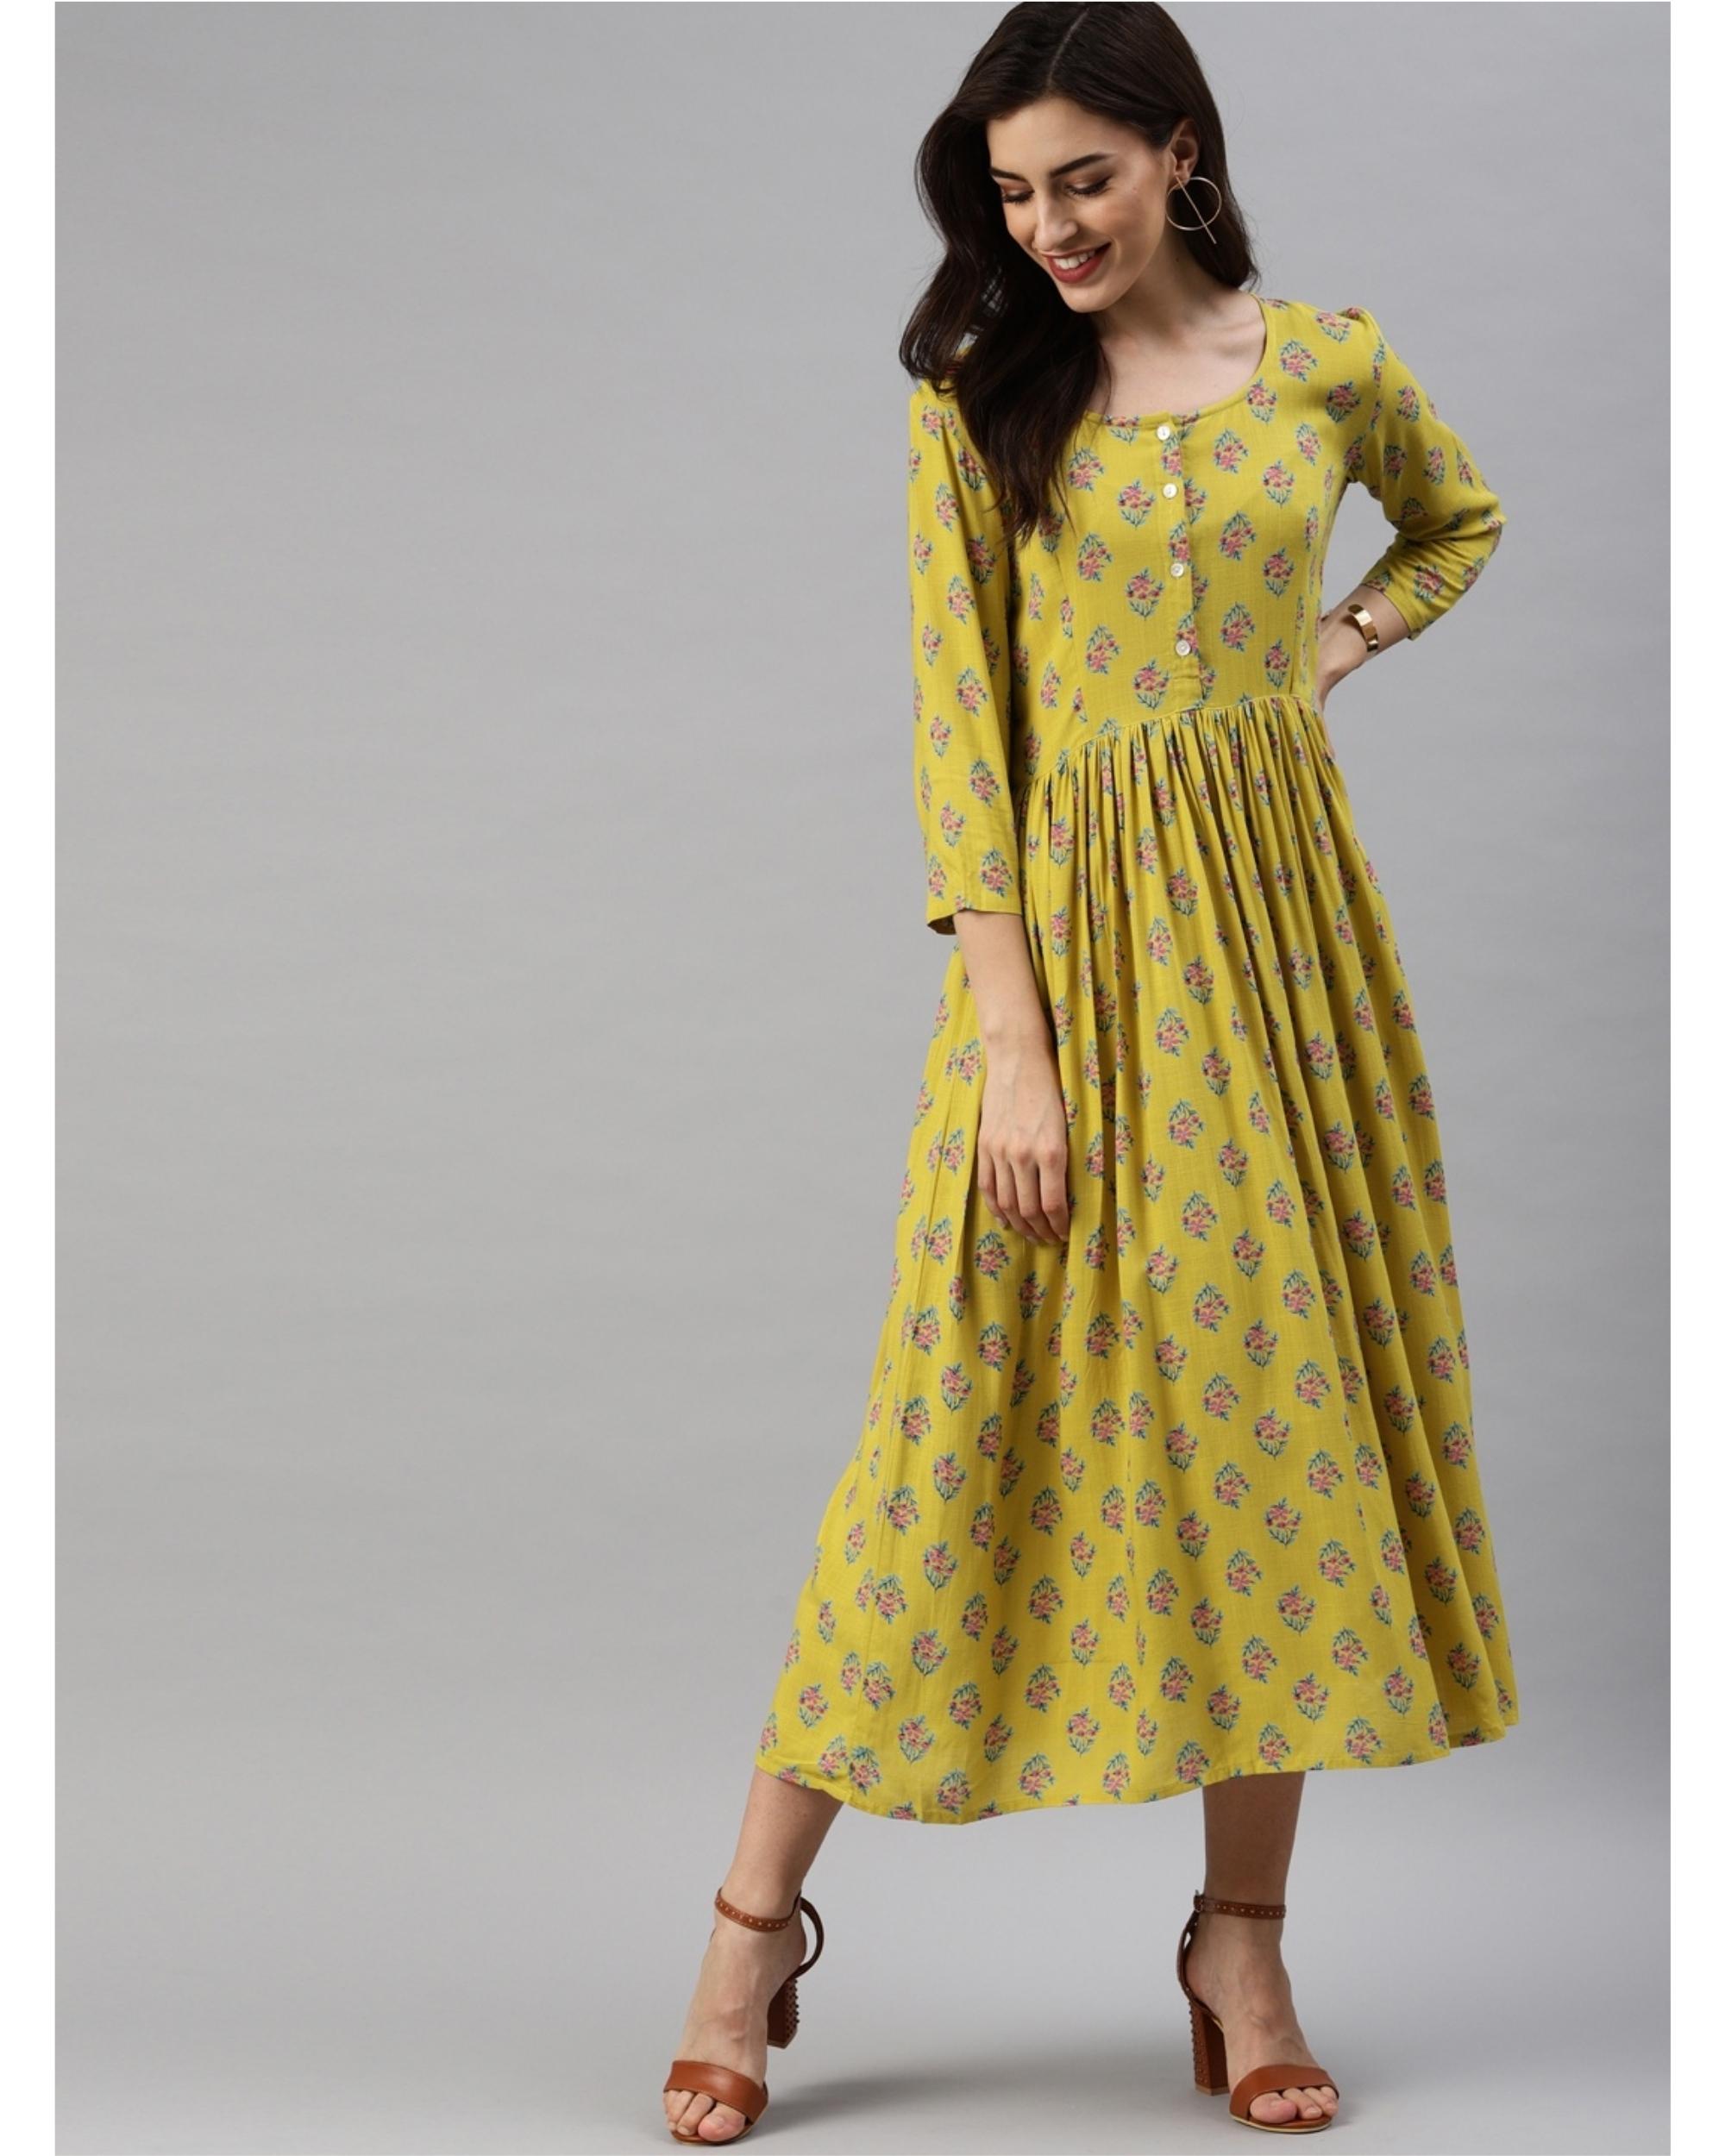 Yellow printed a-line dress